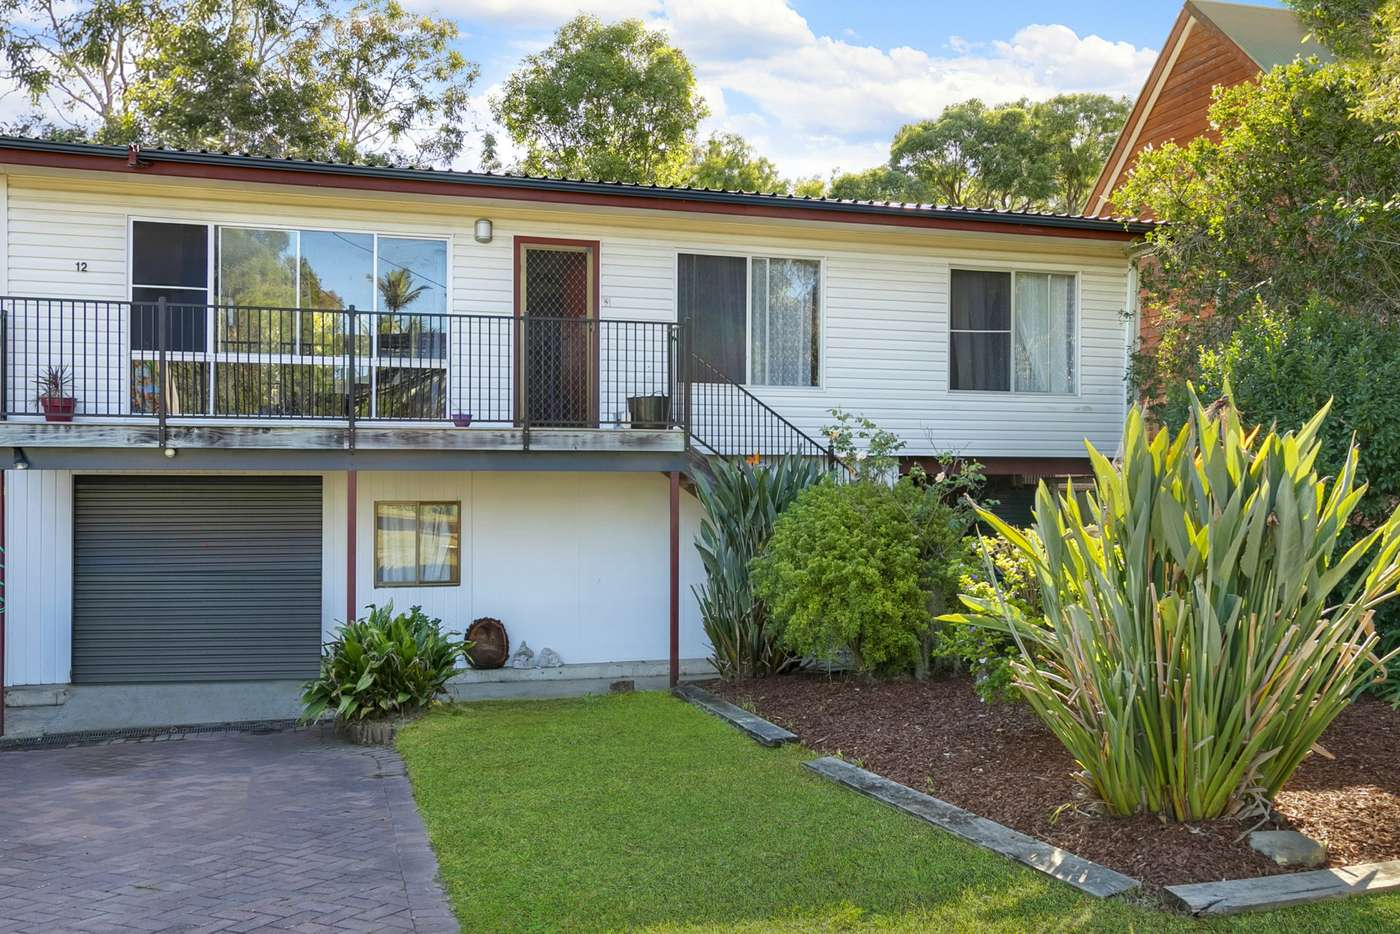 Main view of Homely house listing, 12 Harding Avenue, Lake Munmorah NSW 2259